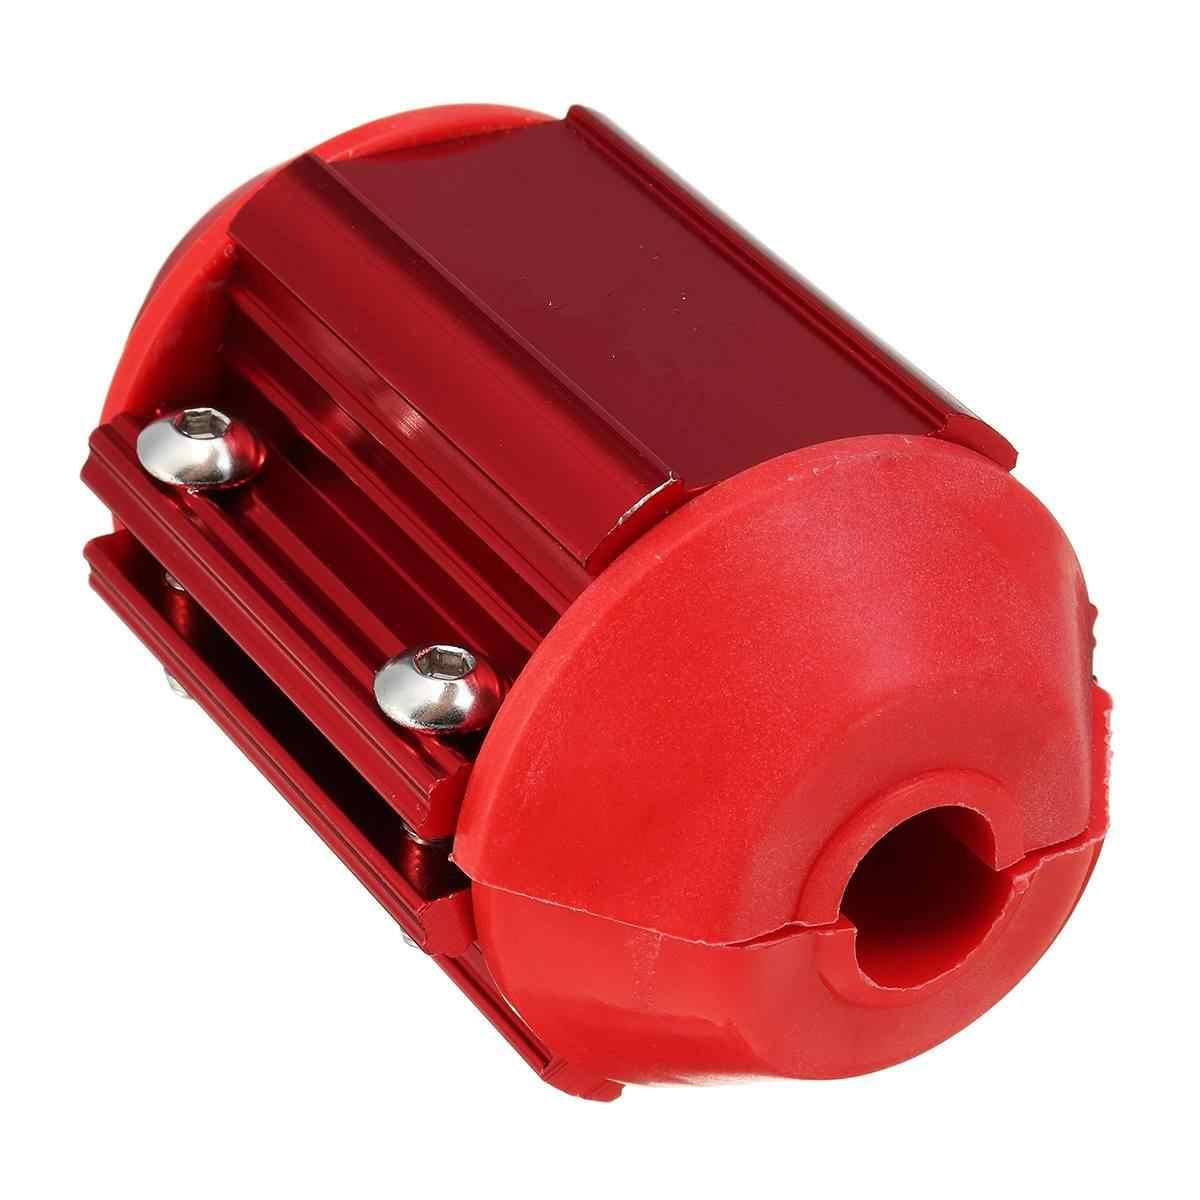 Universal Magnetic Penghemat Bahan Bakar Truk Gas Bahan Bakar Minyak Economizer Mobil Power Saver Kendaraan Bahan Bakar Magnet Hemat dengan Alat